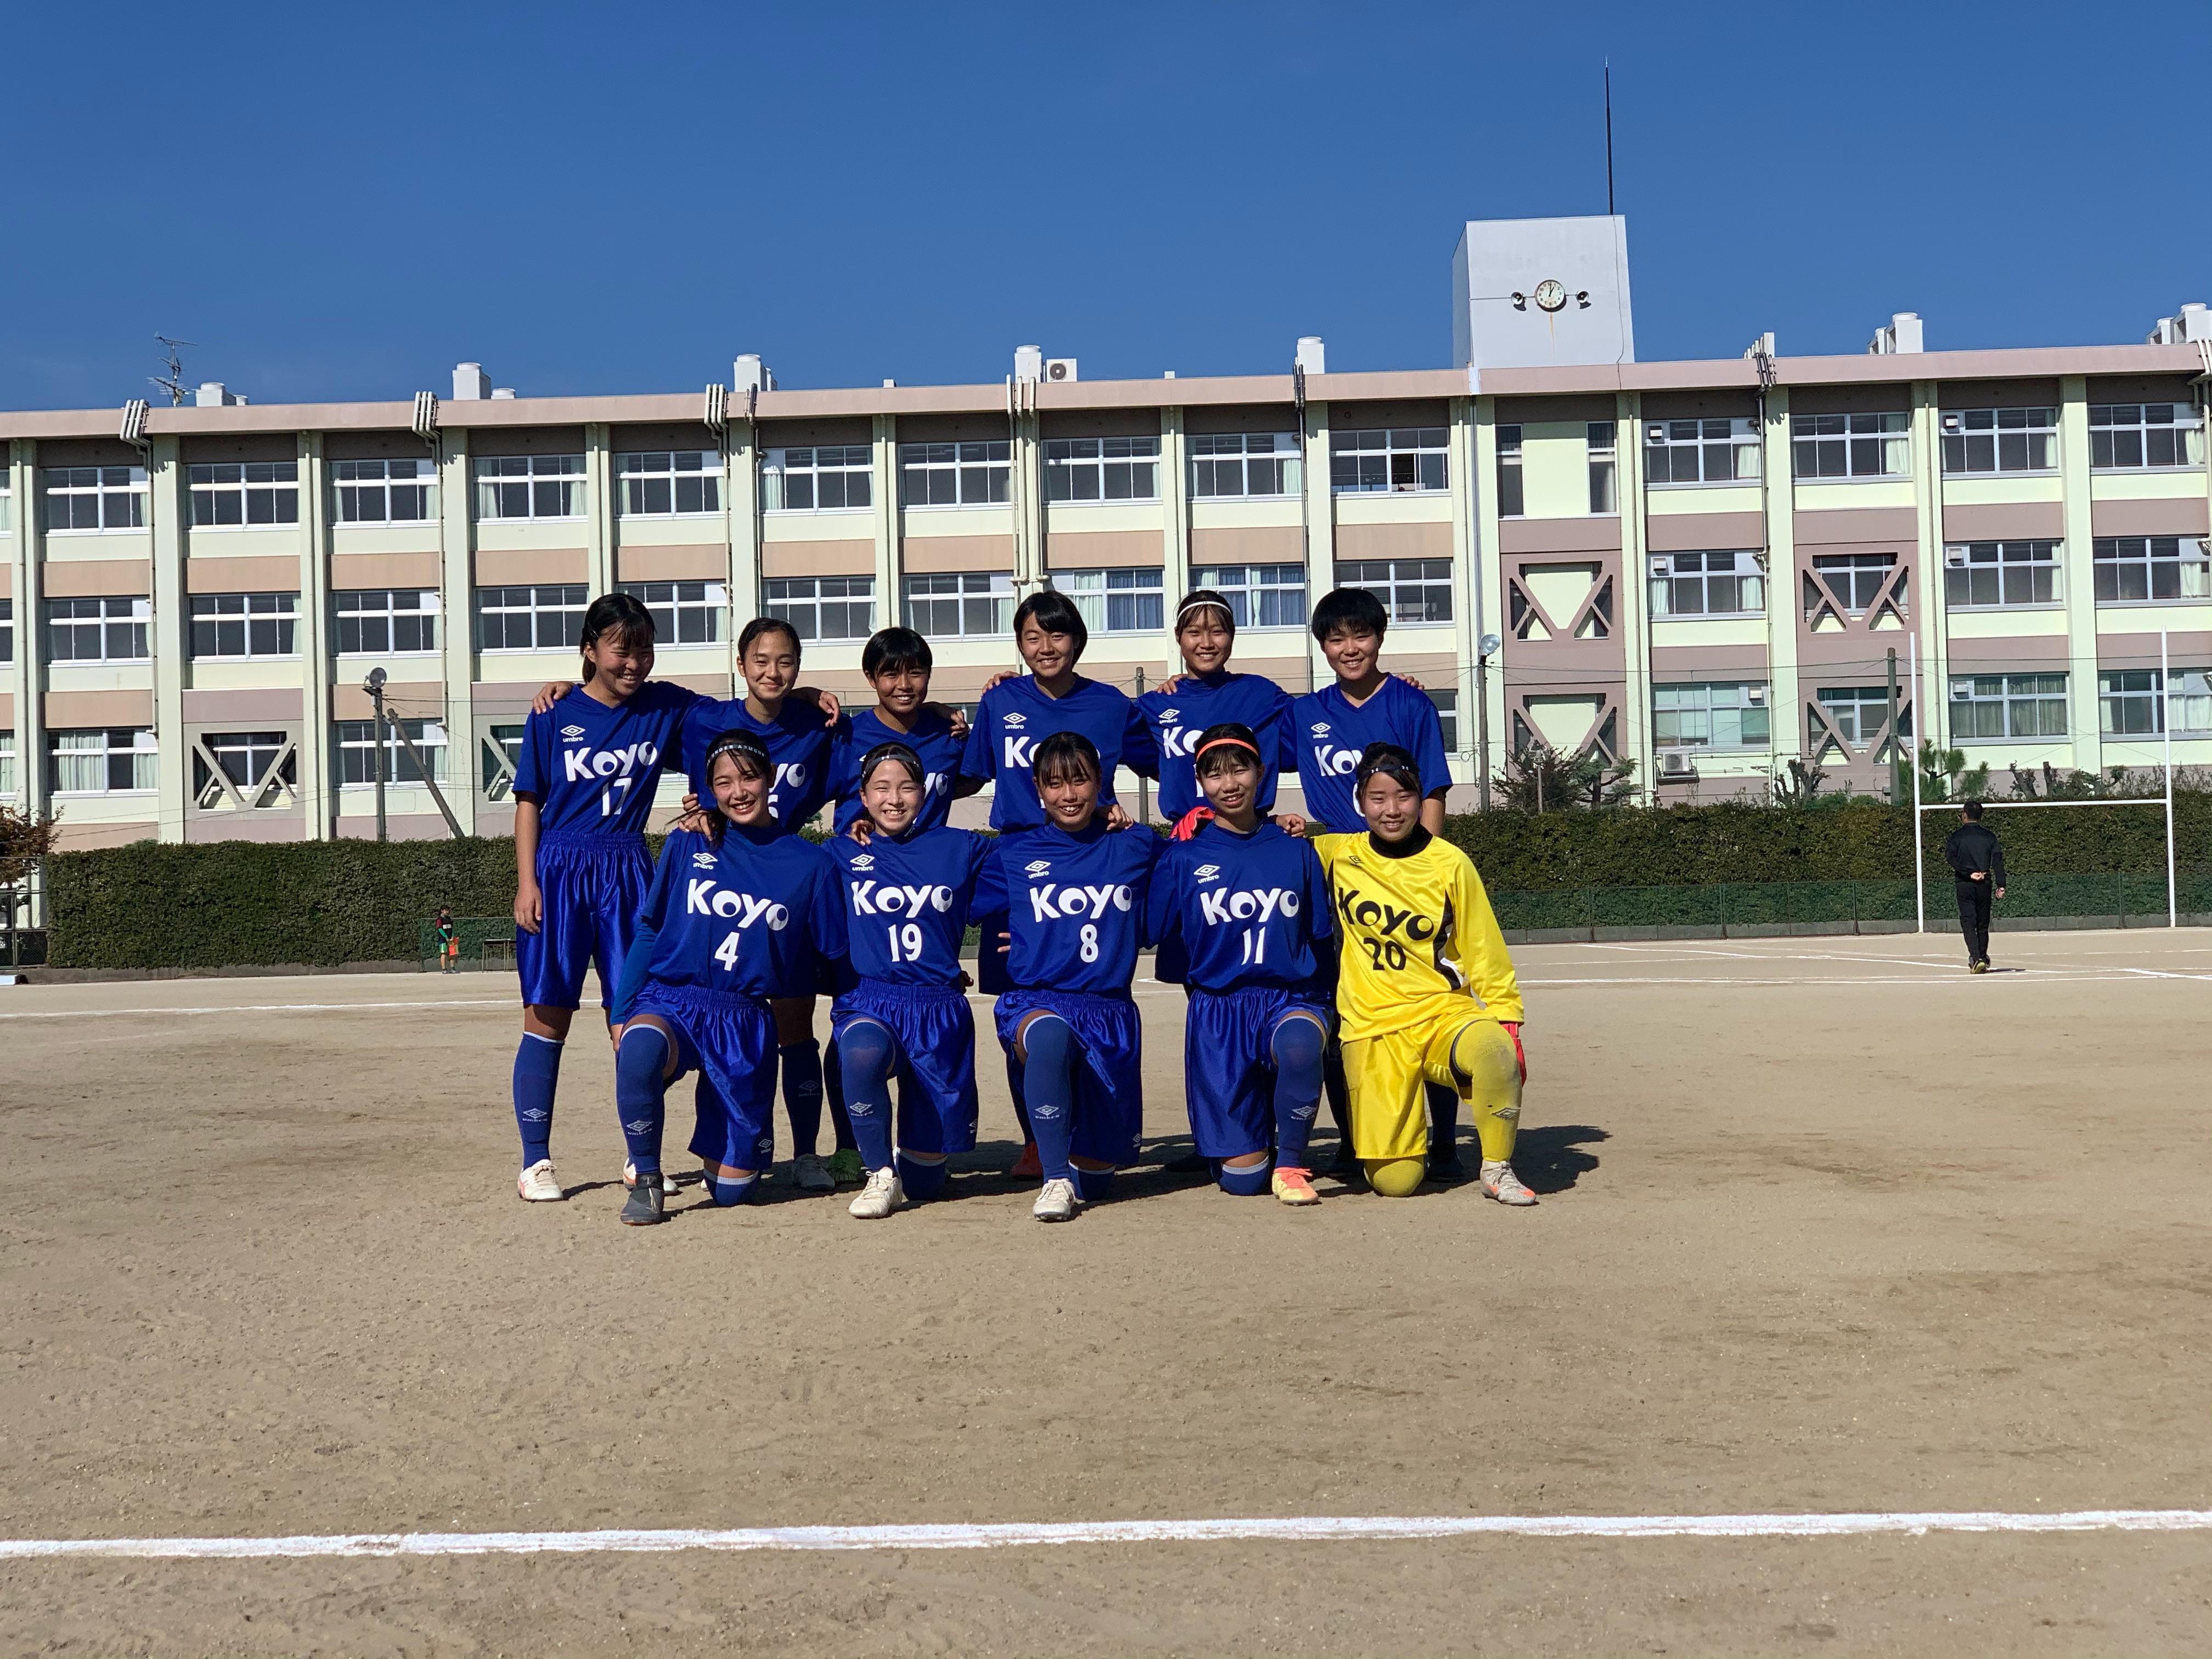 http://www.kyoto-be.ne.jp/kouyou-hs/mt/school_life/images/%E5%90%91%E9%99%BDVS%E7%9C%8C%E8%A5%BF.jpeg